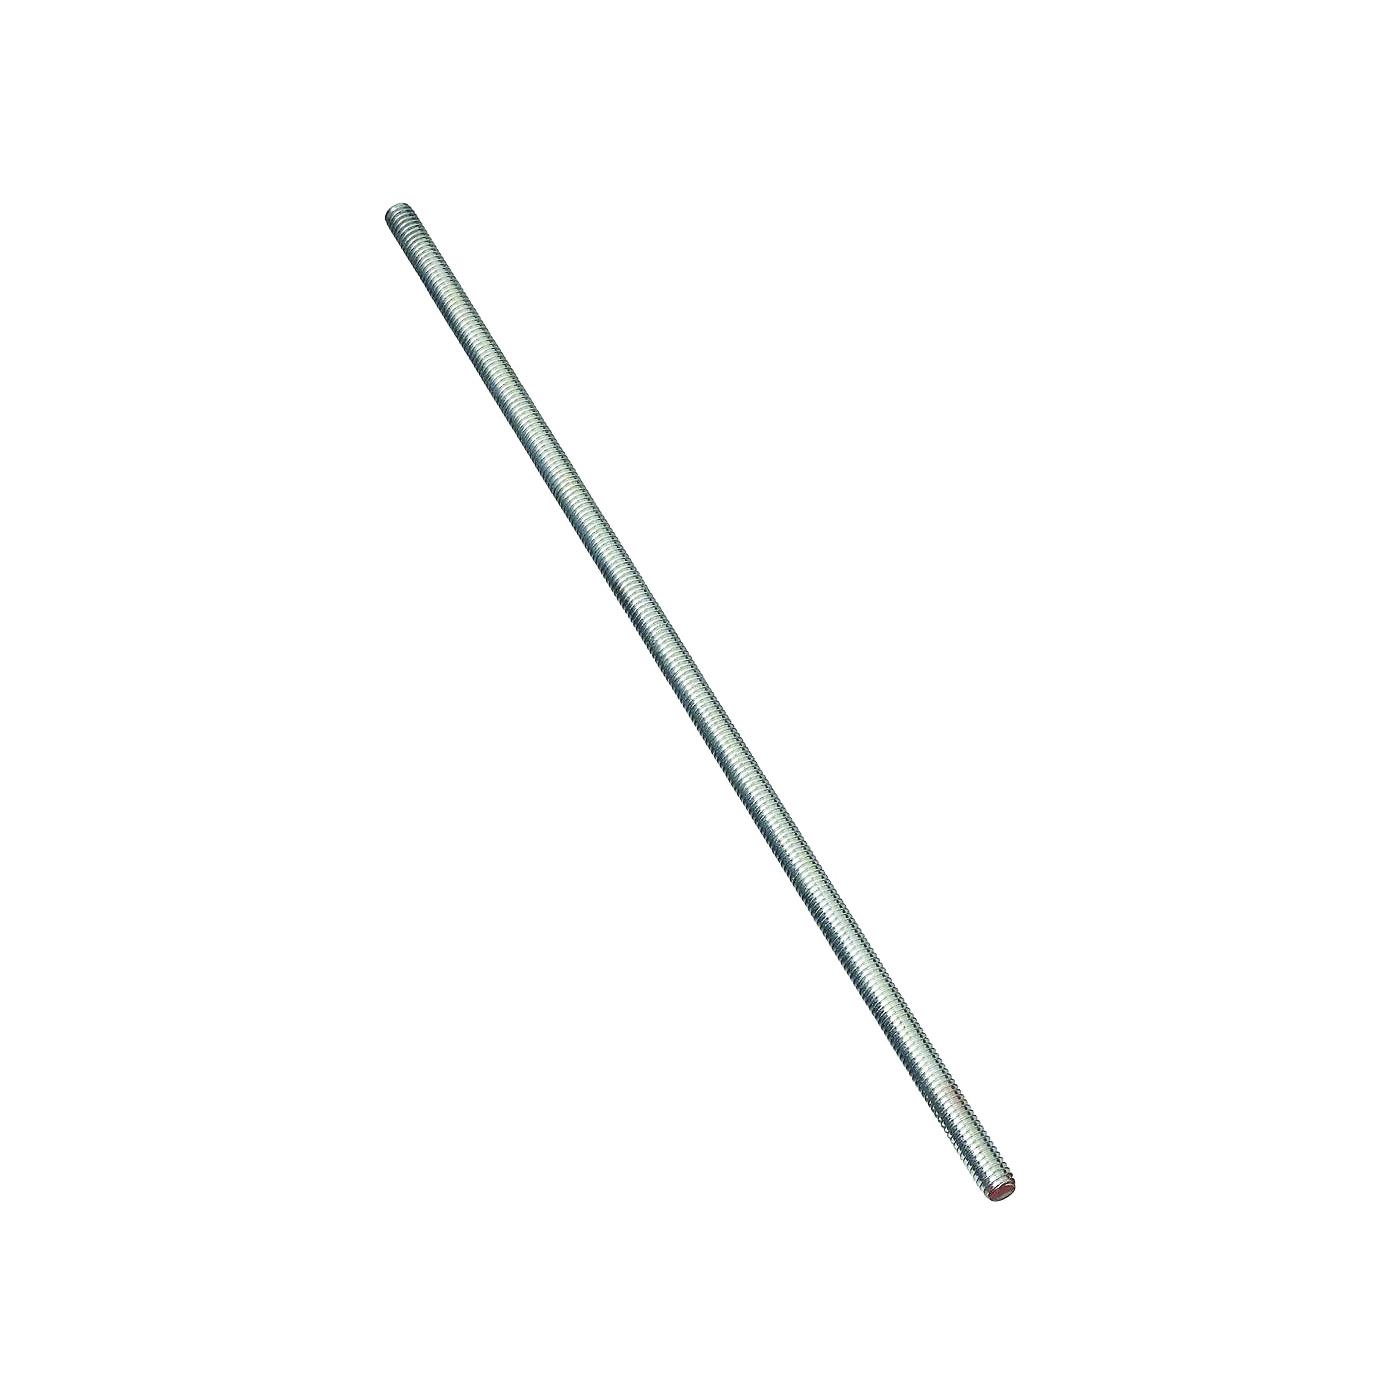 Picture of Stanley Hardware 179325 Threaded Rod, 5/16-18 Thread, 12 in L, A Grade, Steel, Zinc, UNC Thread